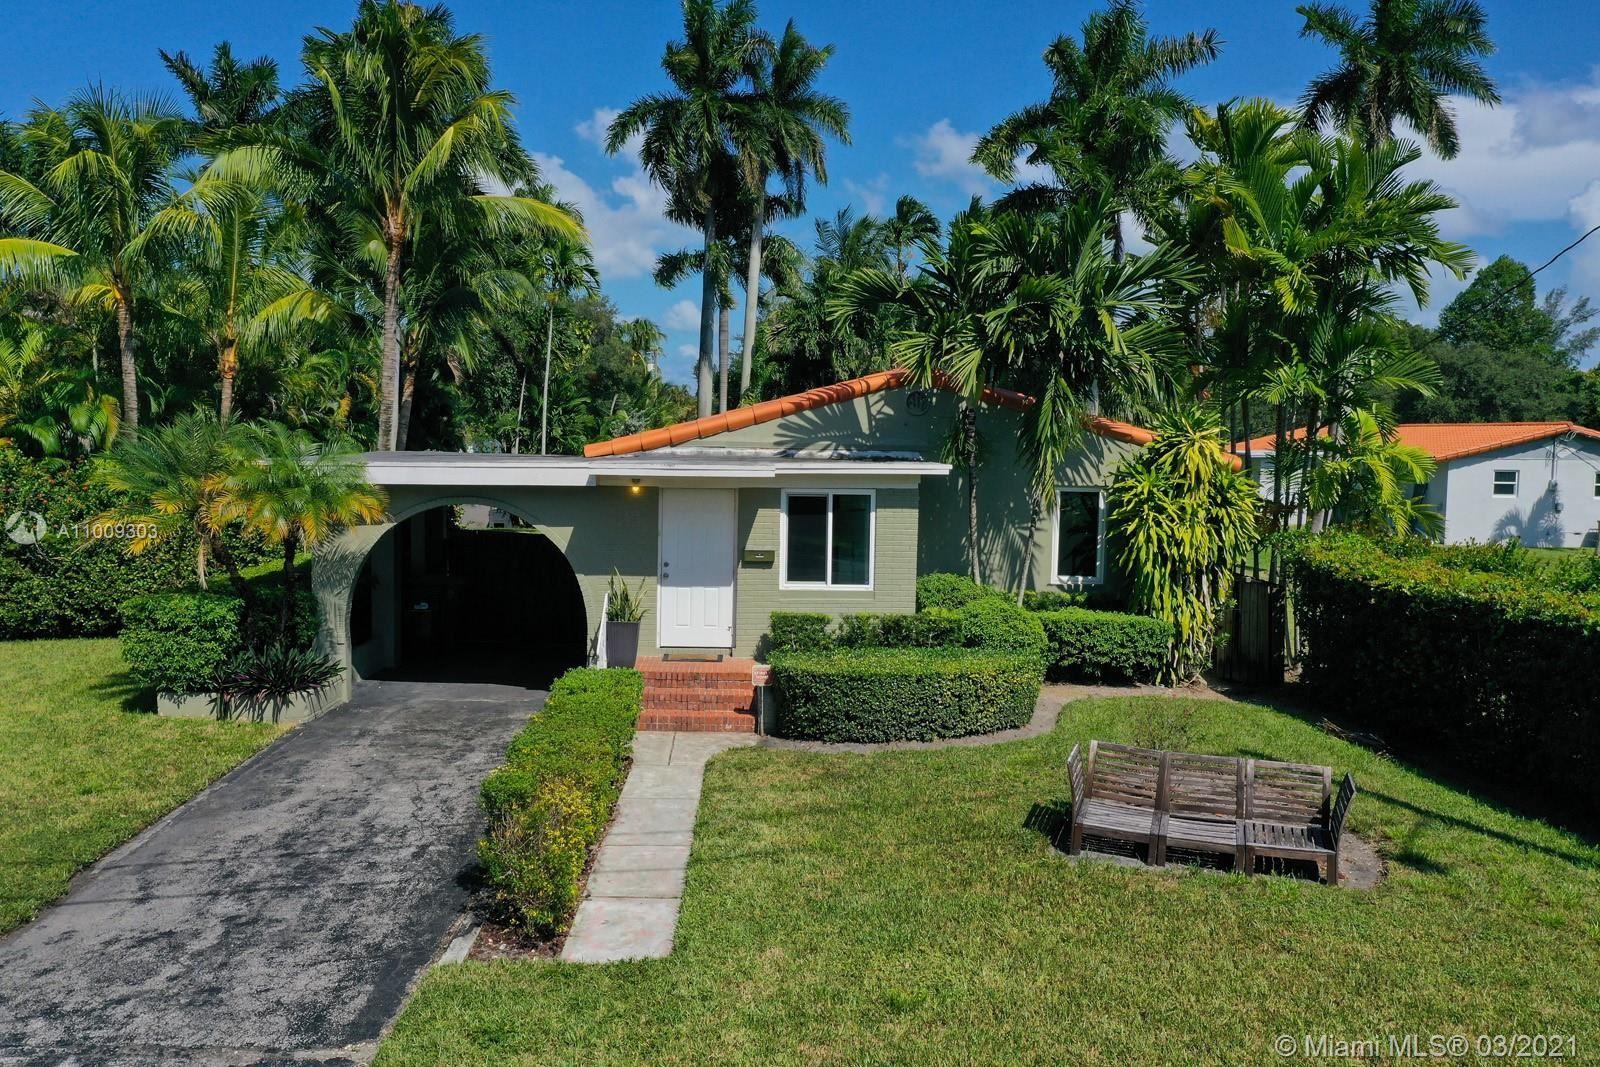 Photo of 8633 NE Miami Ct, El Portal, FL 33138 (MLS # A11009303)